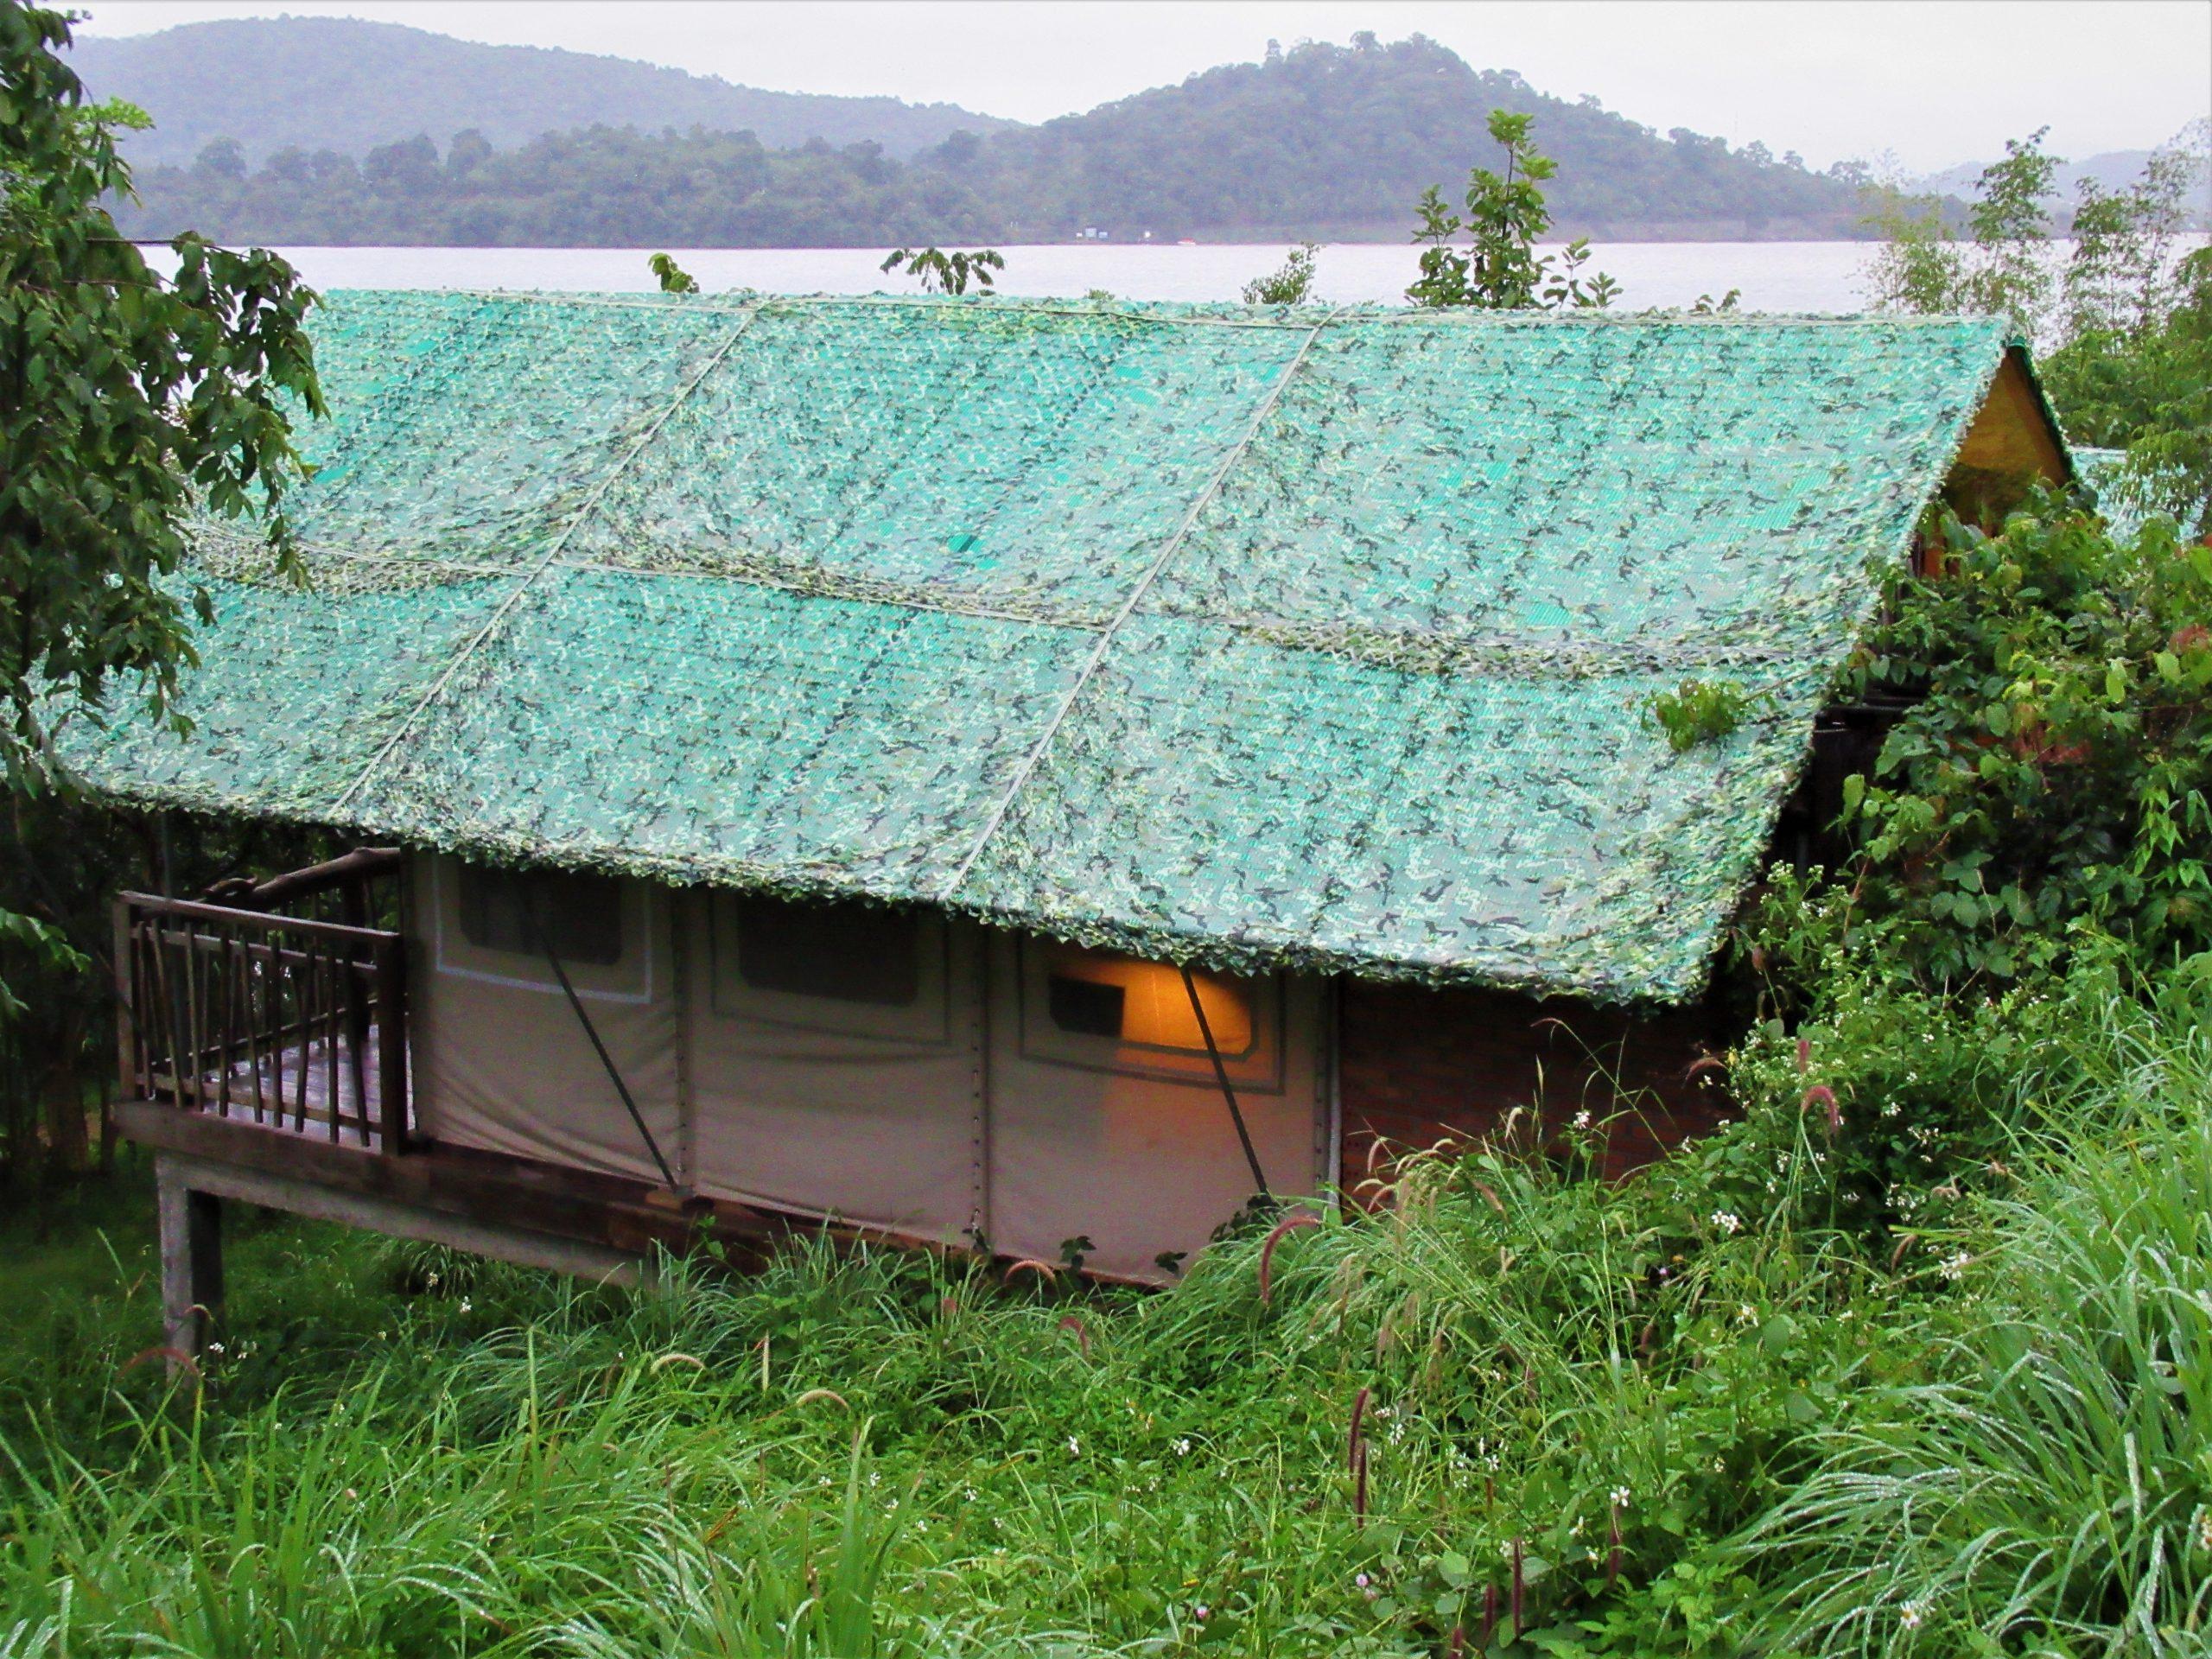 Lak Tented Camp, Dak Lak, Vietnam